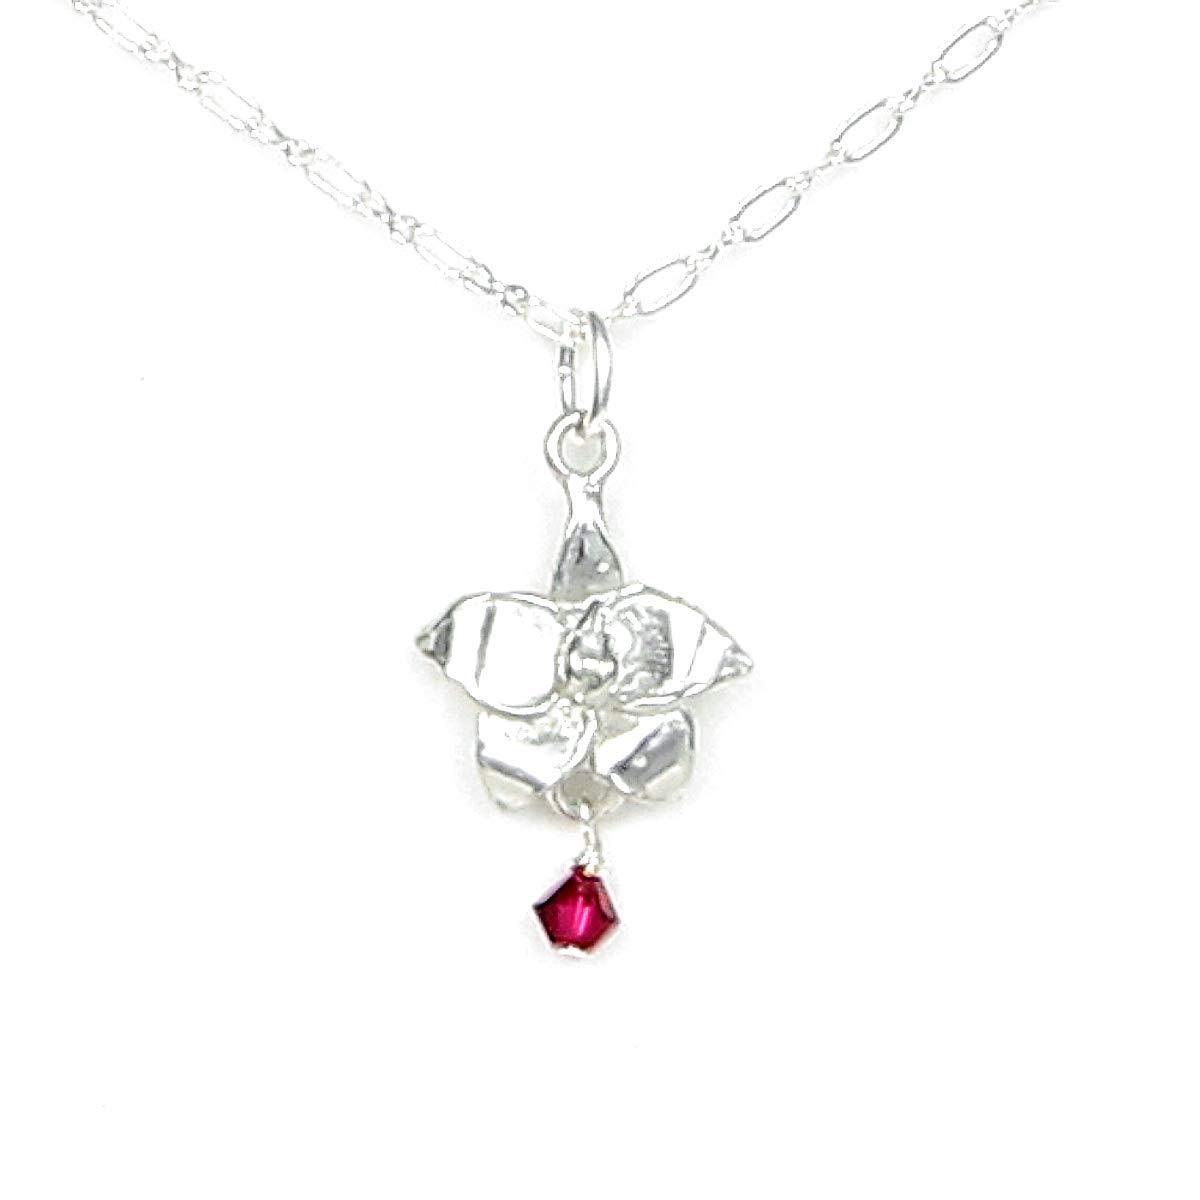 July Birthflower Ruby Birthstone Necklace Birth flower Larkspur birthstone necklace